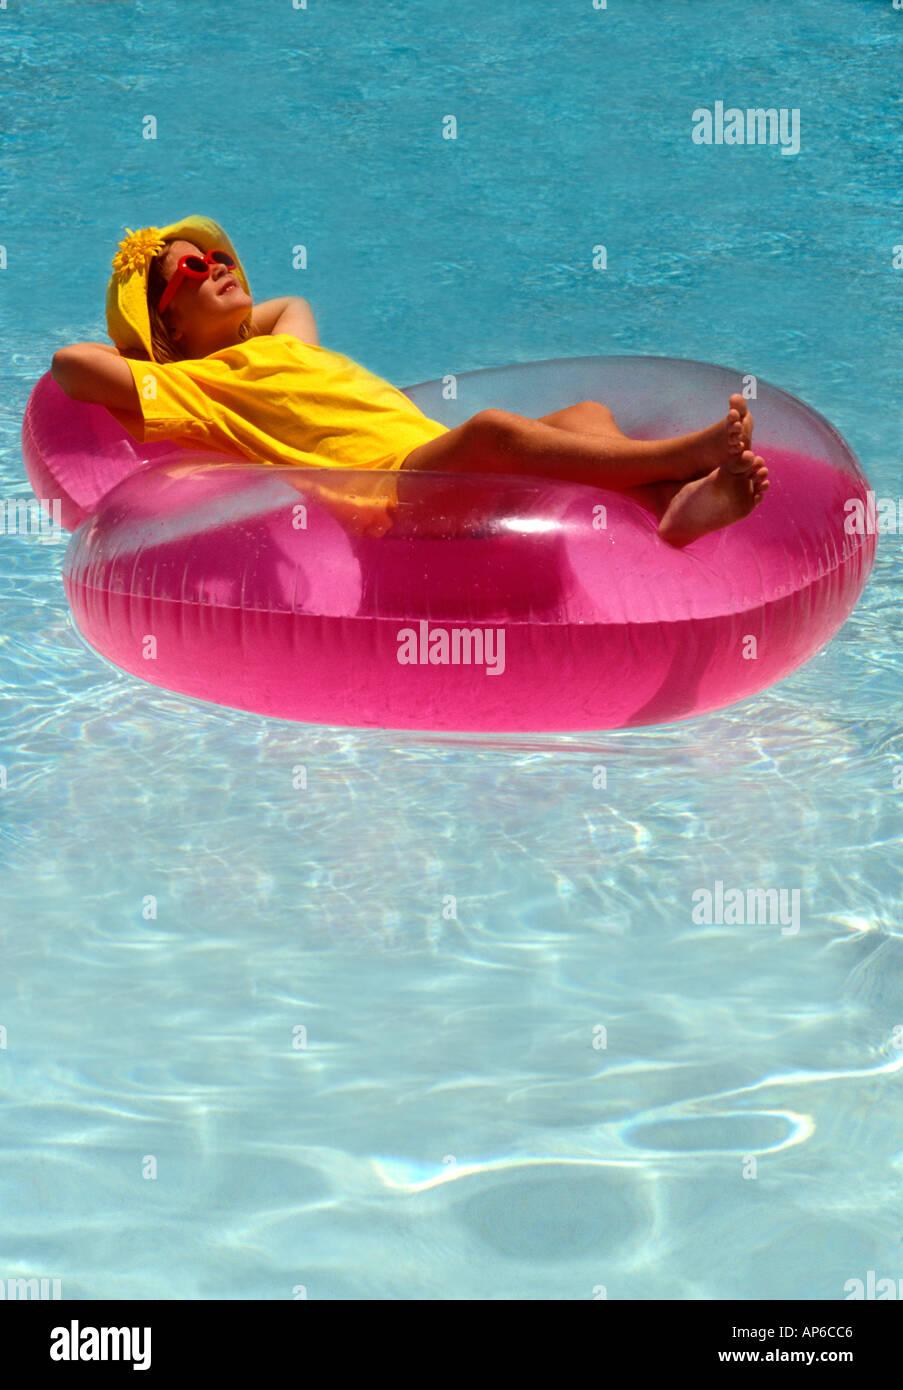 Yellow lilo stock photos yellow lilo stock images alamy - Swimming pool girl christmas vacation ...